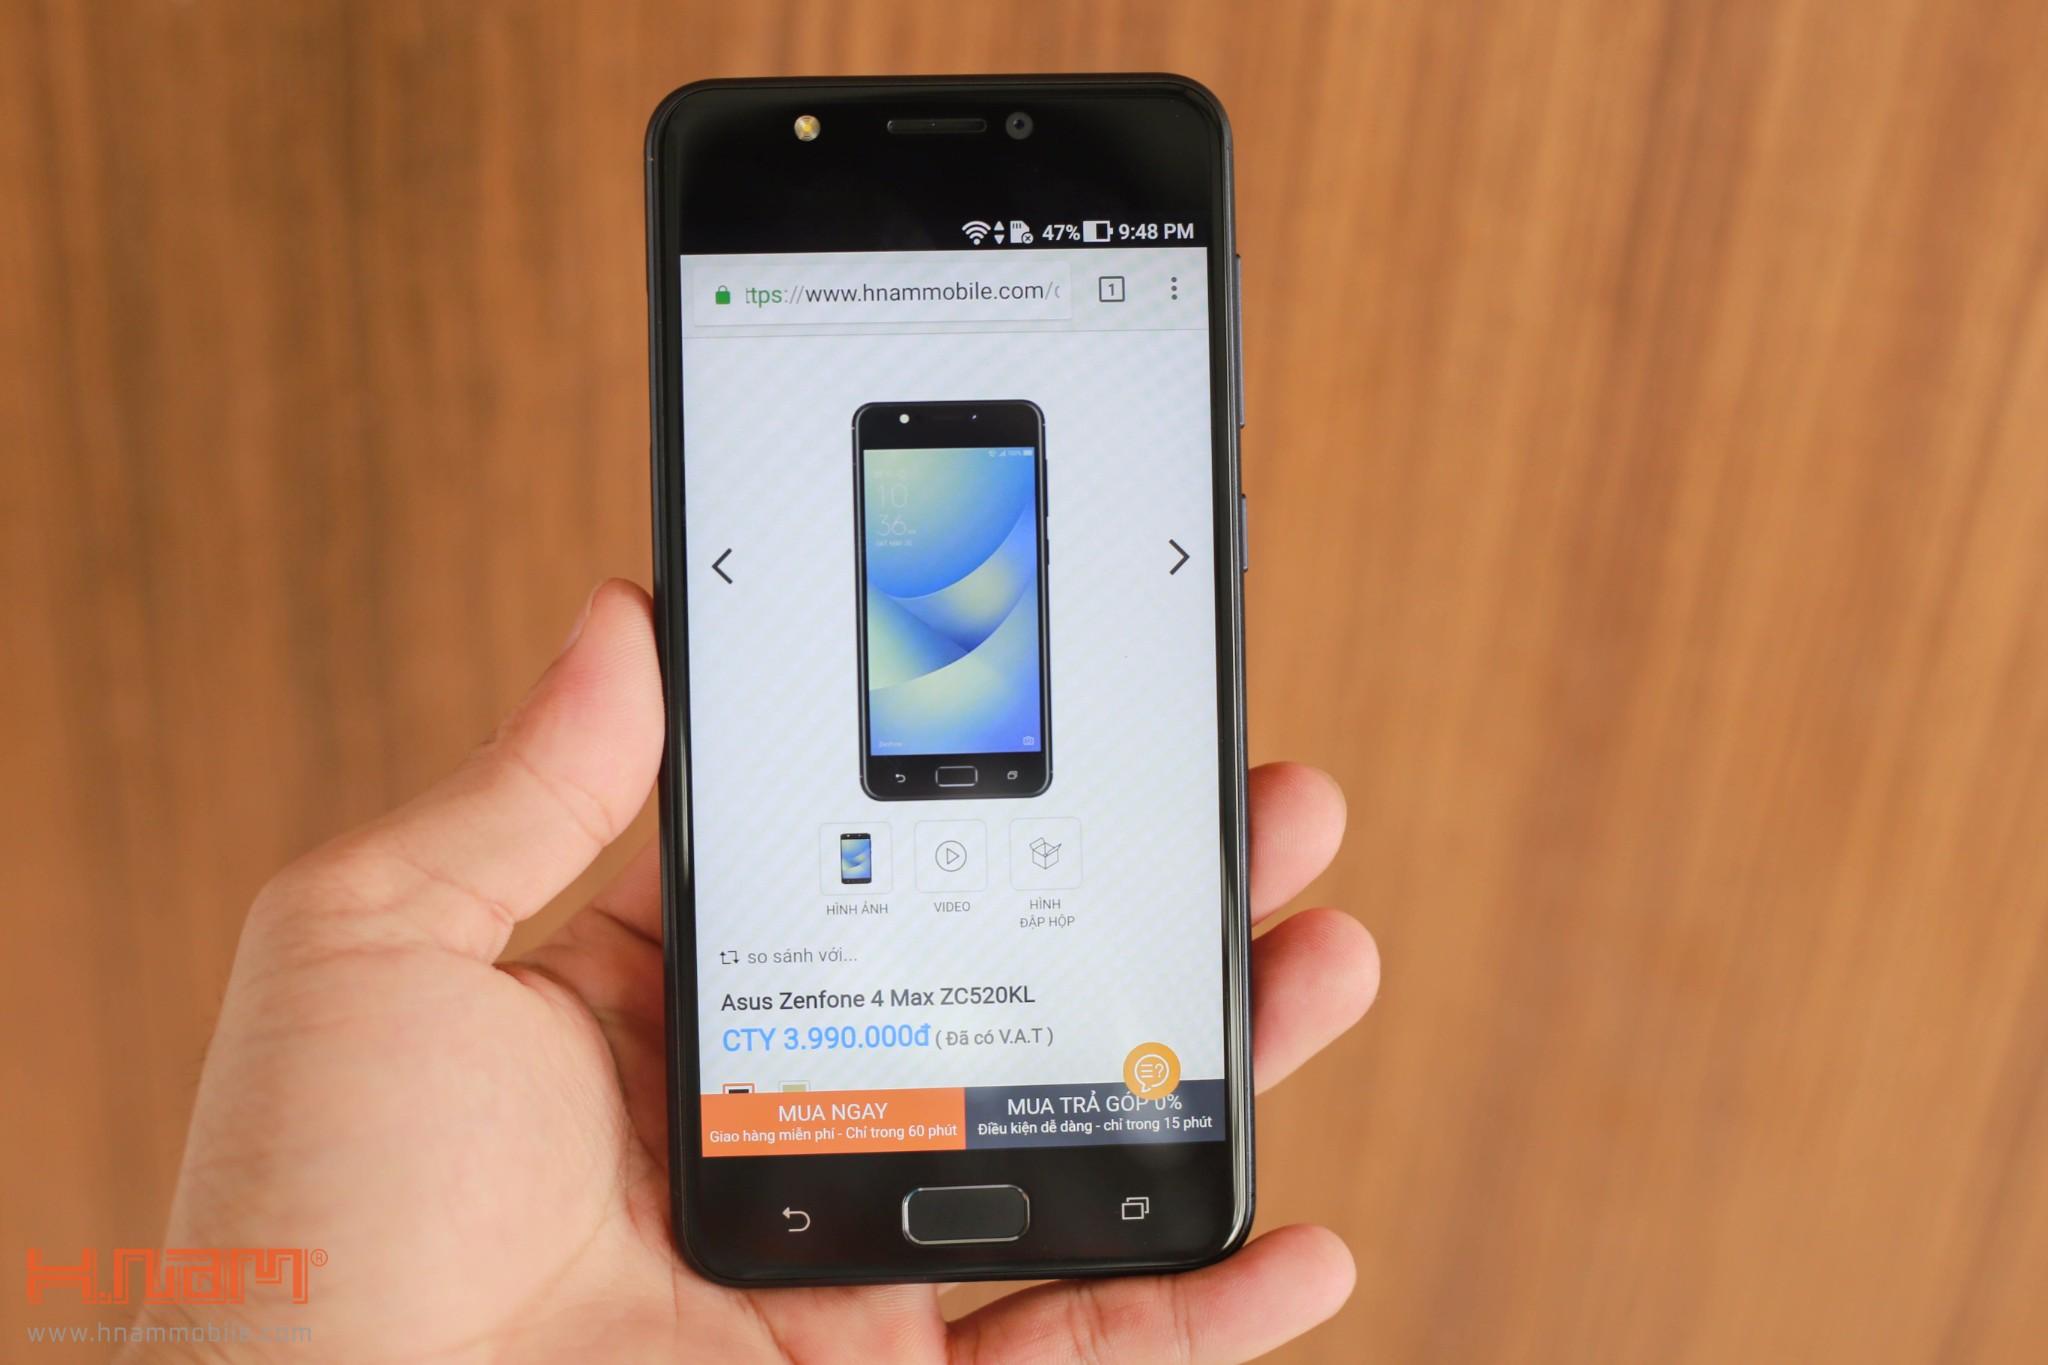 ... pin Trên tay ZenFone 4 Max: Tân binh giá 4 triệu có camera kép, pin